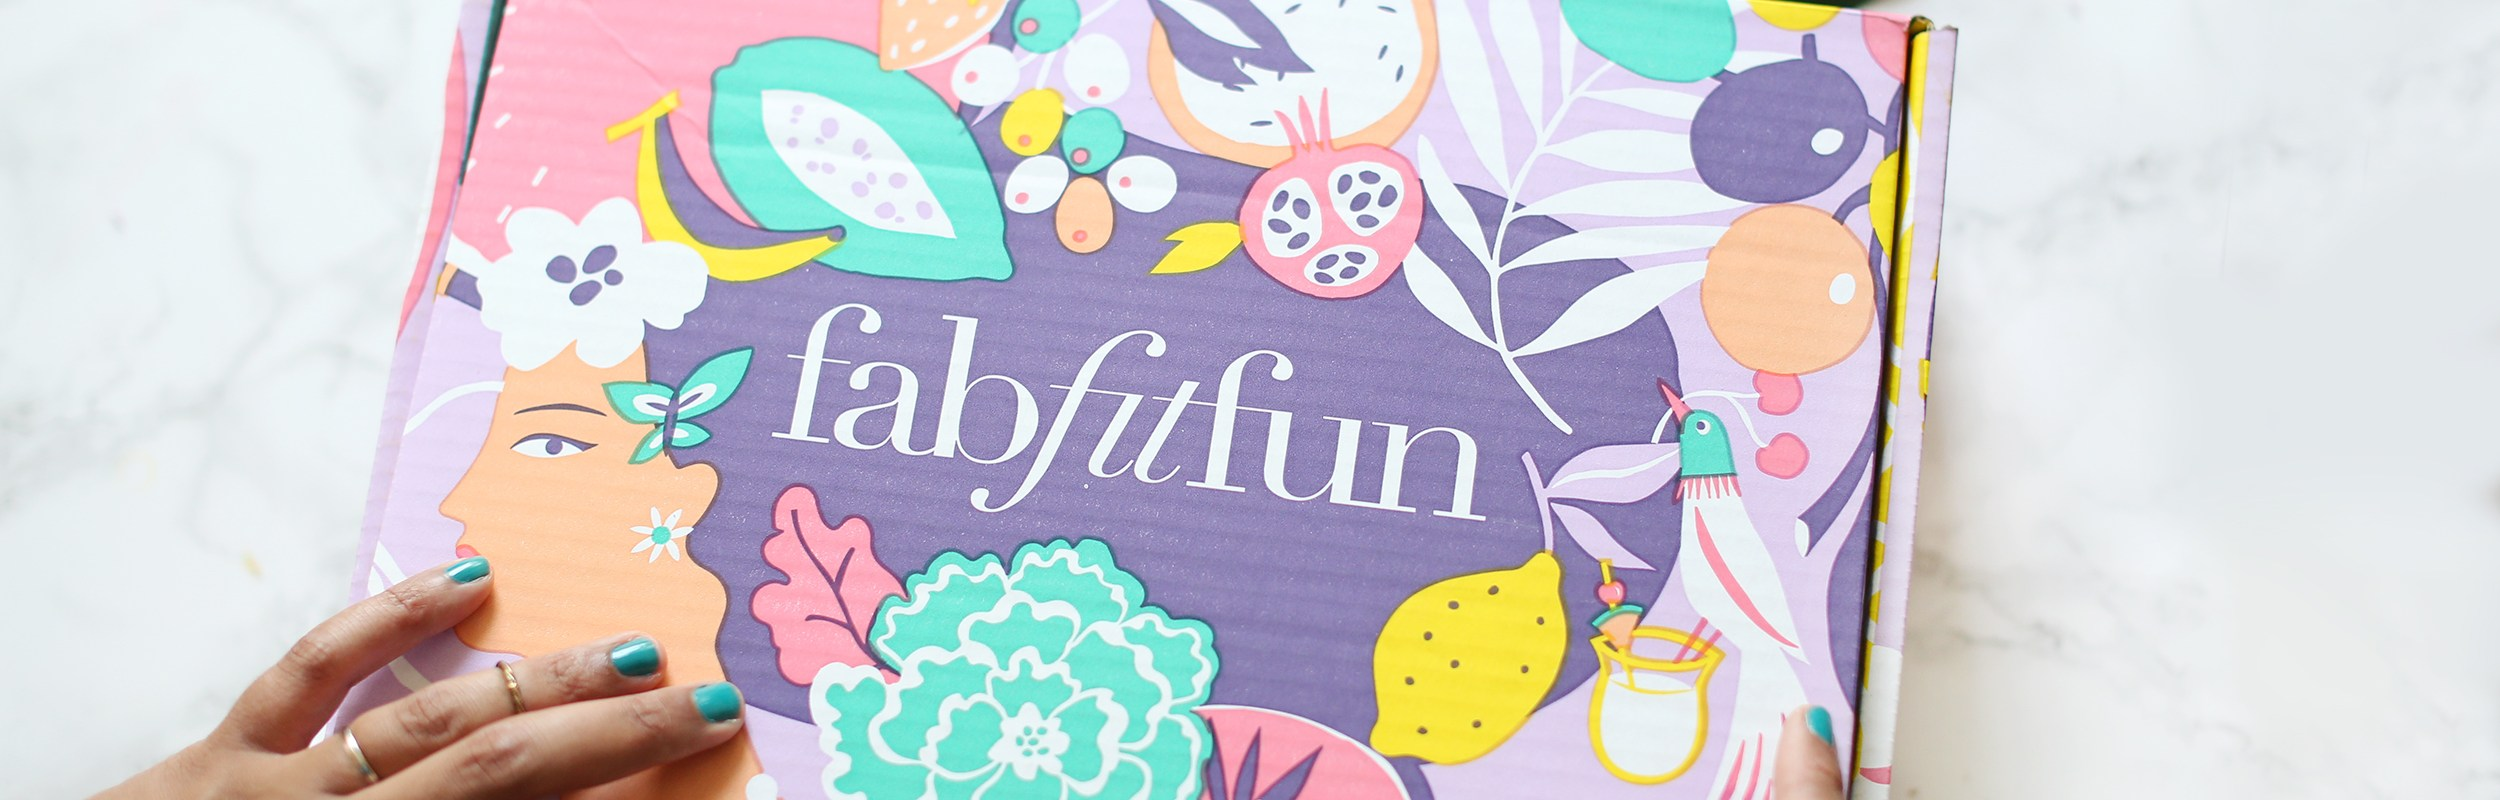 Review of the Amazing FabFitFun Summer Box -healthyaiblog.com